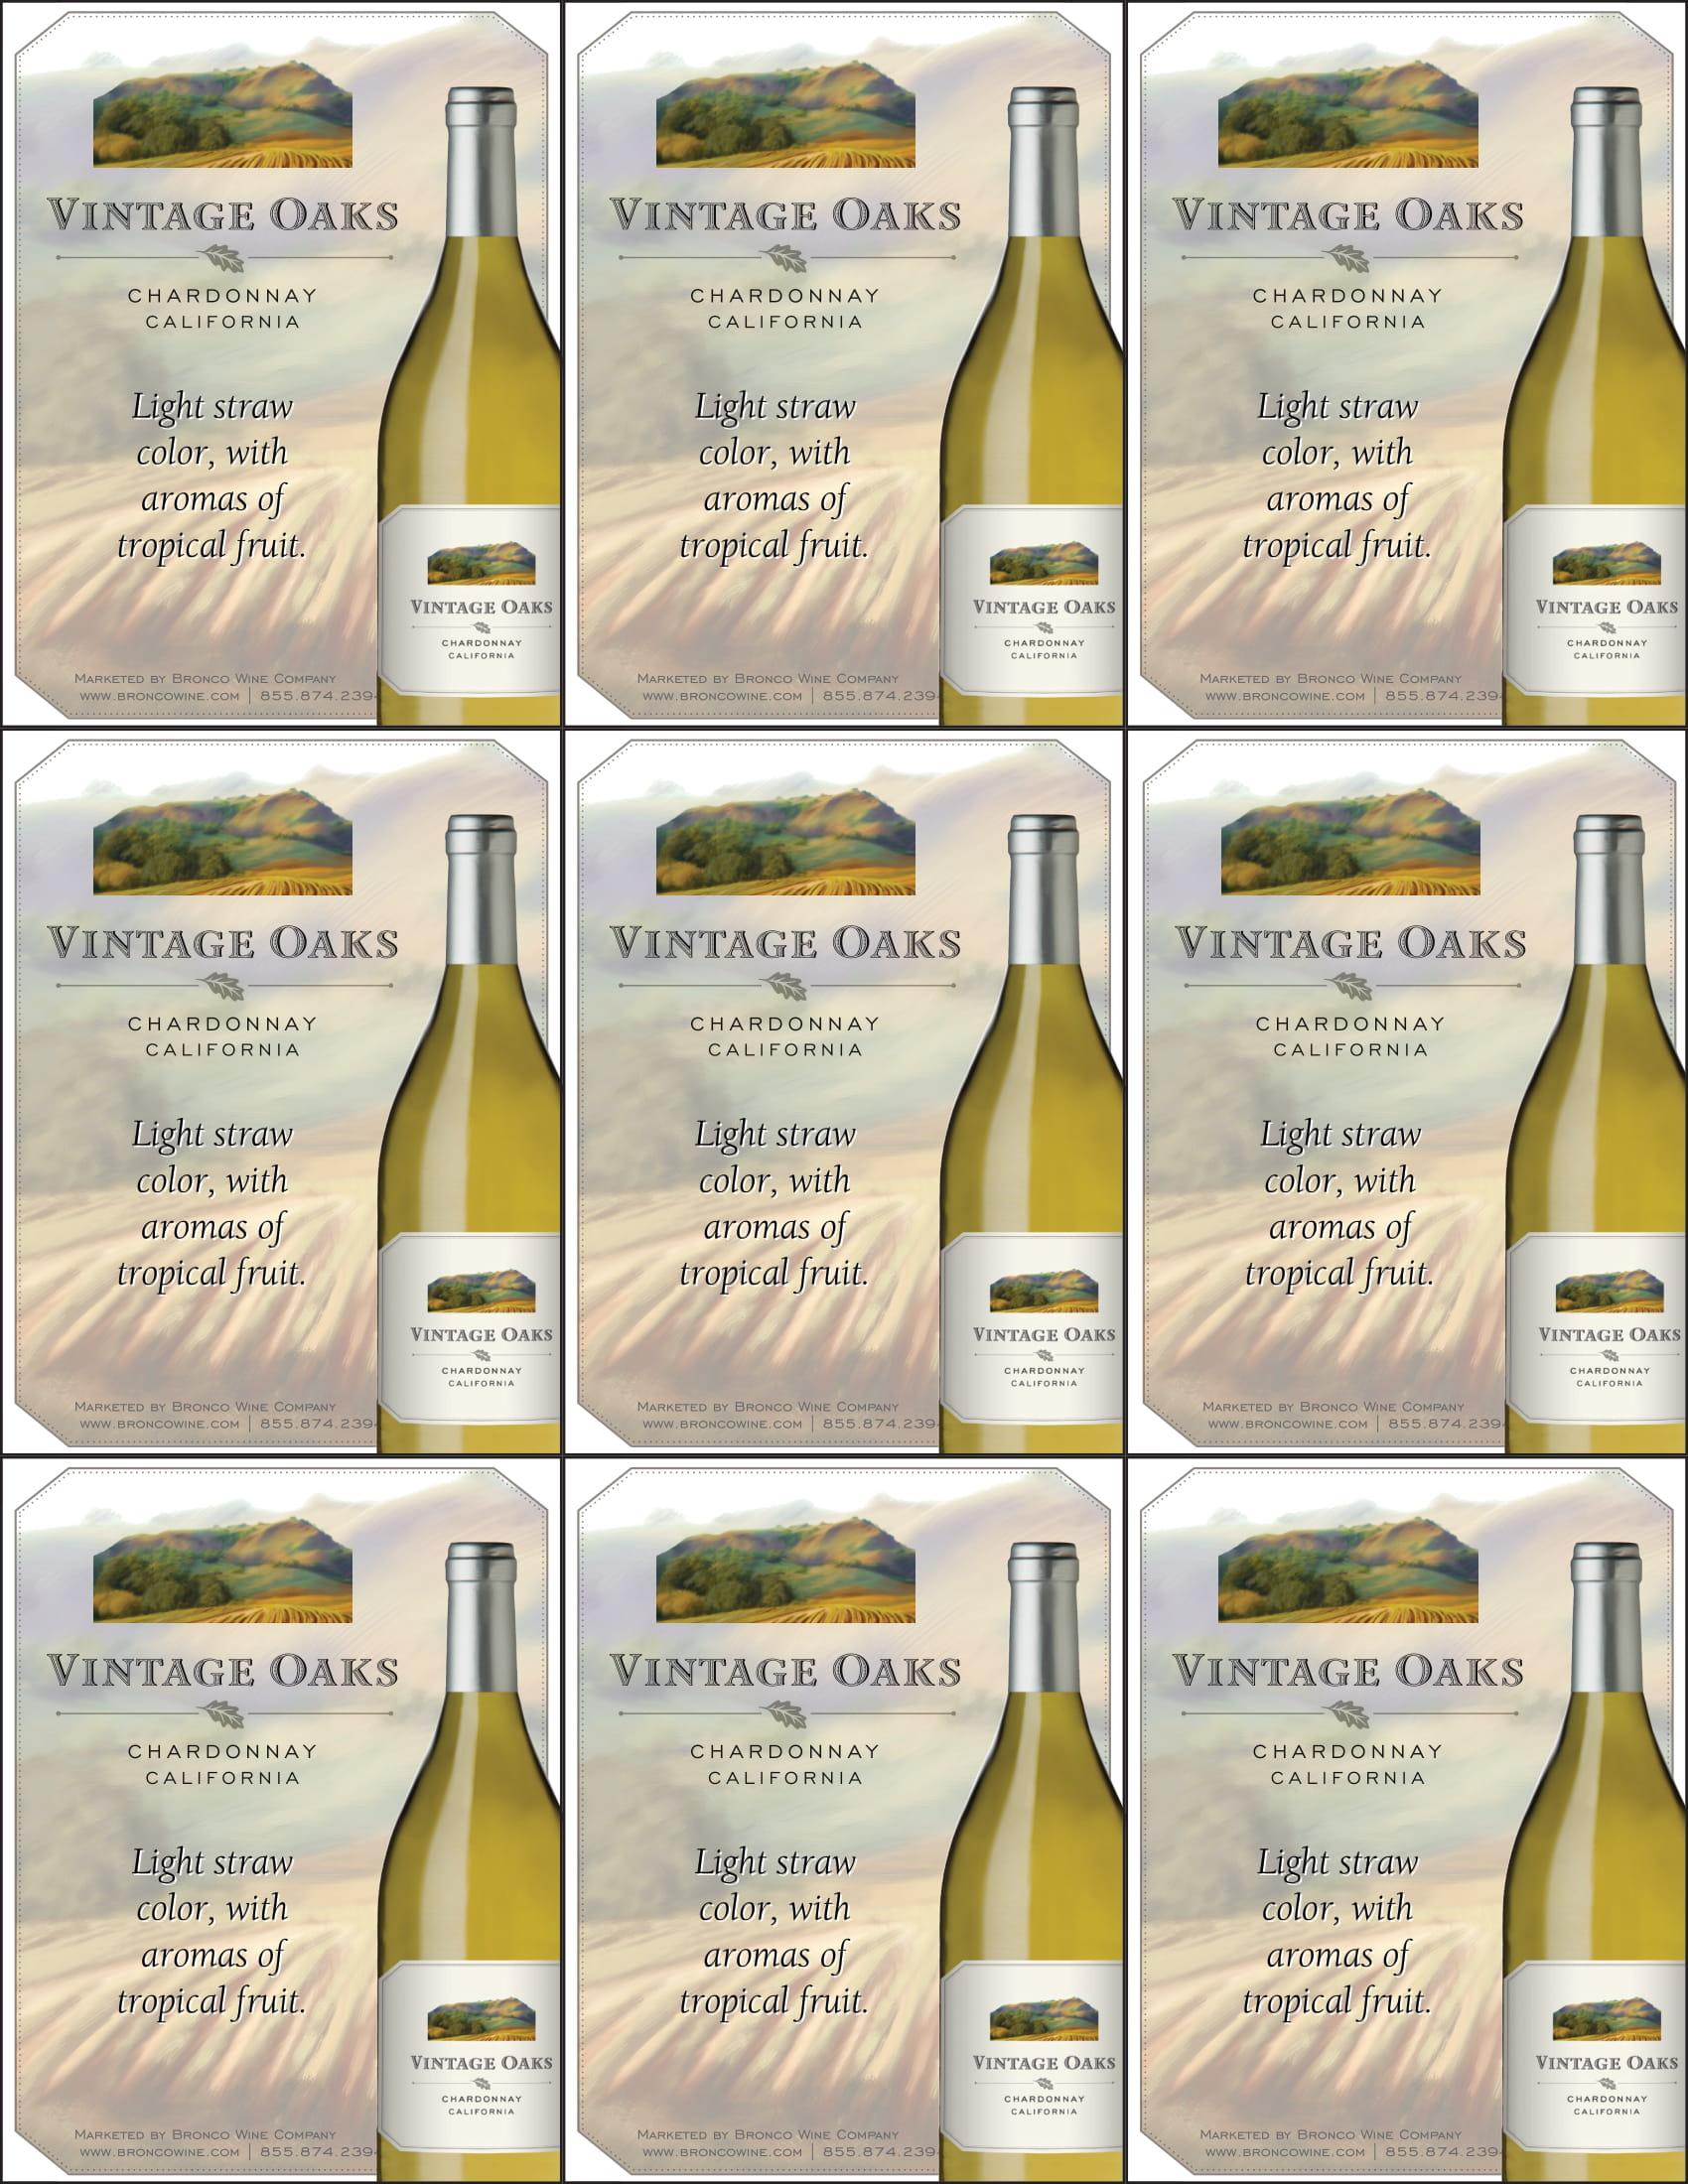 Vintage Oaks Chardonnay Shelf Talker